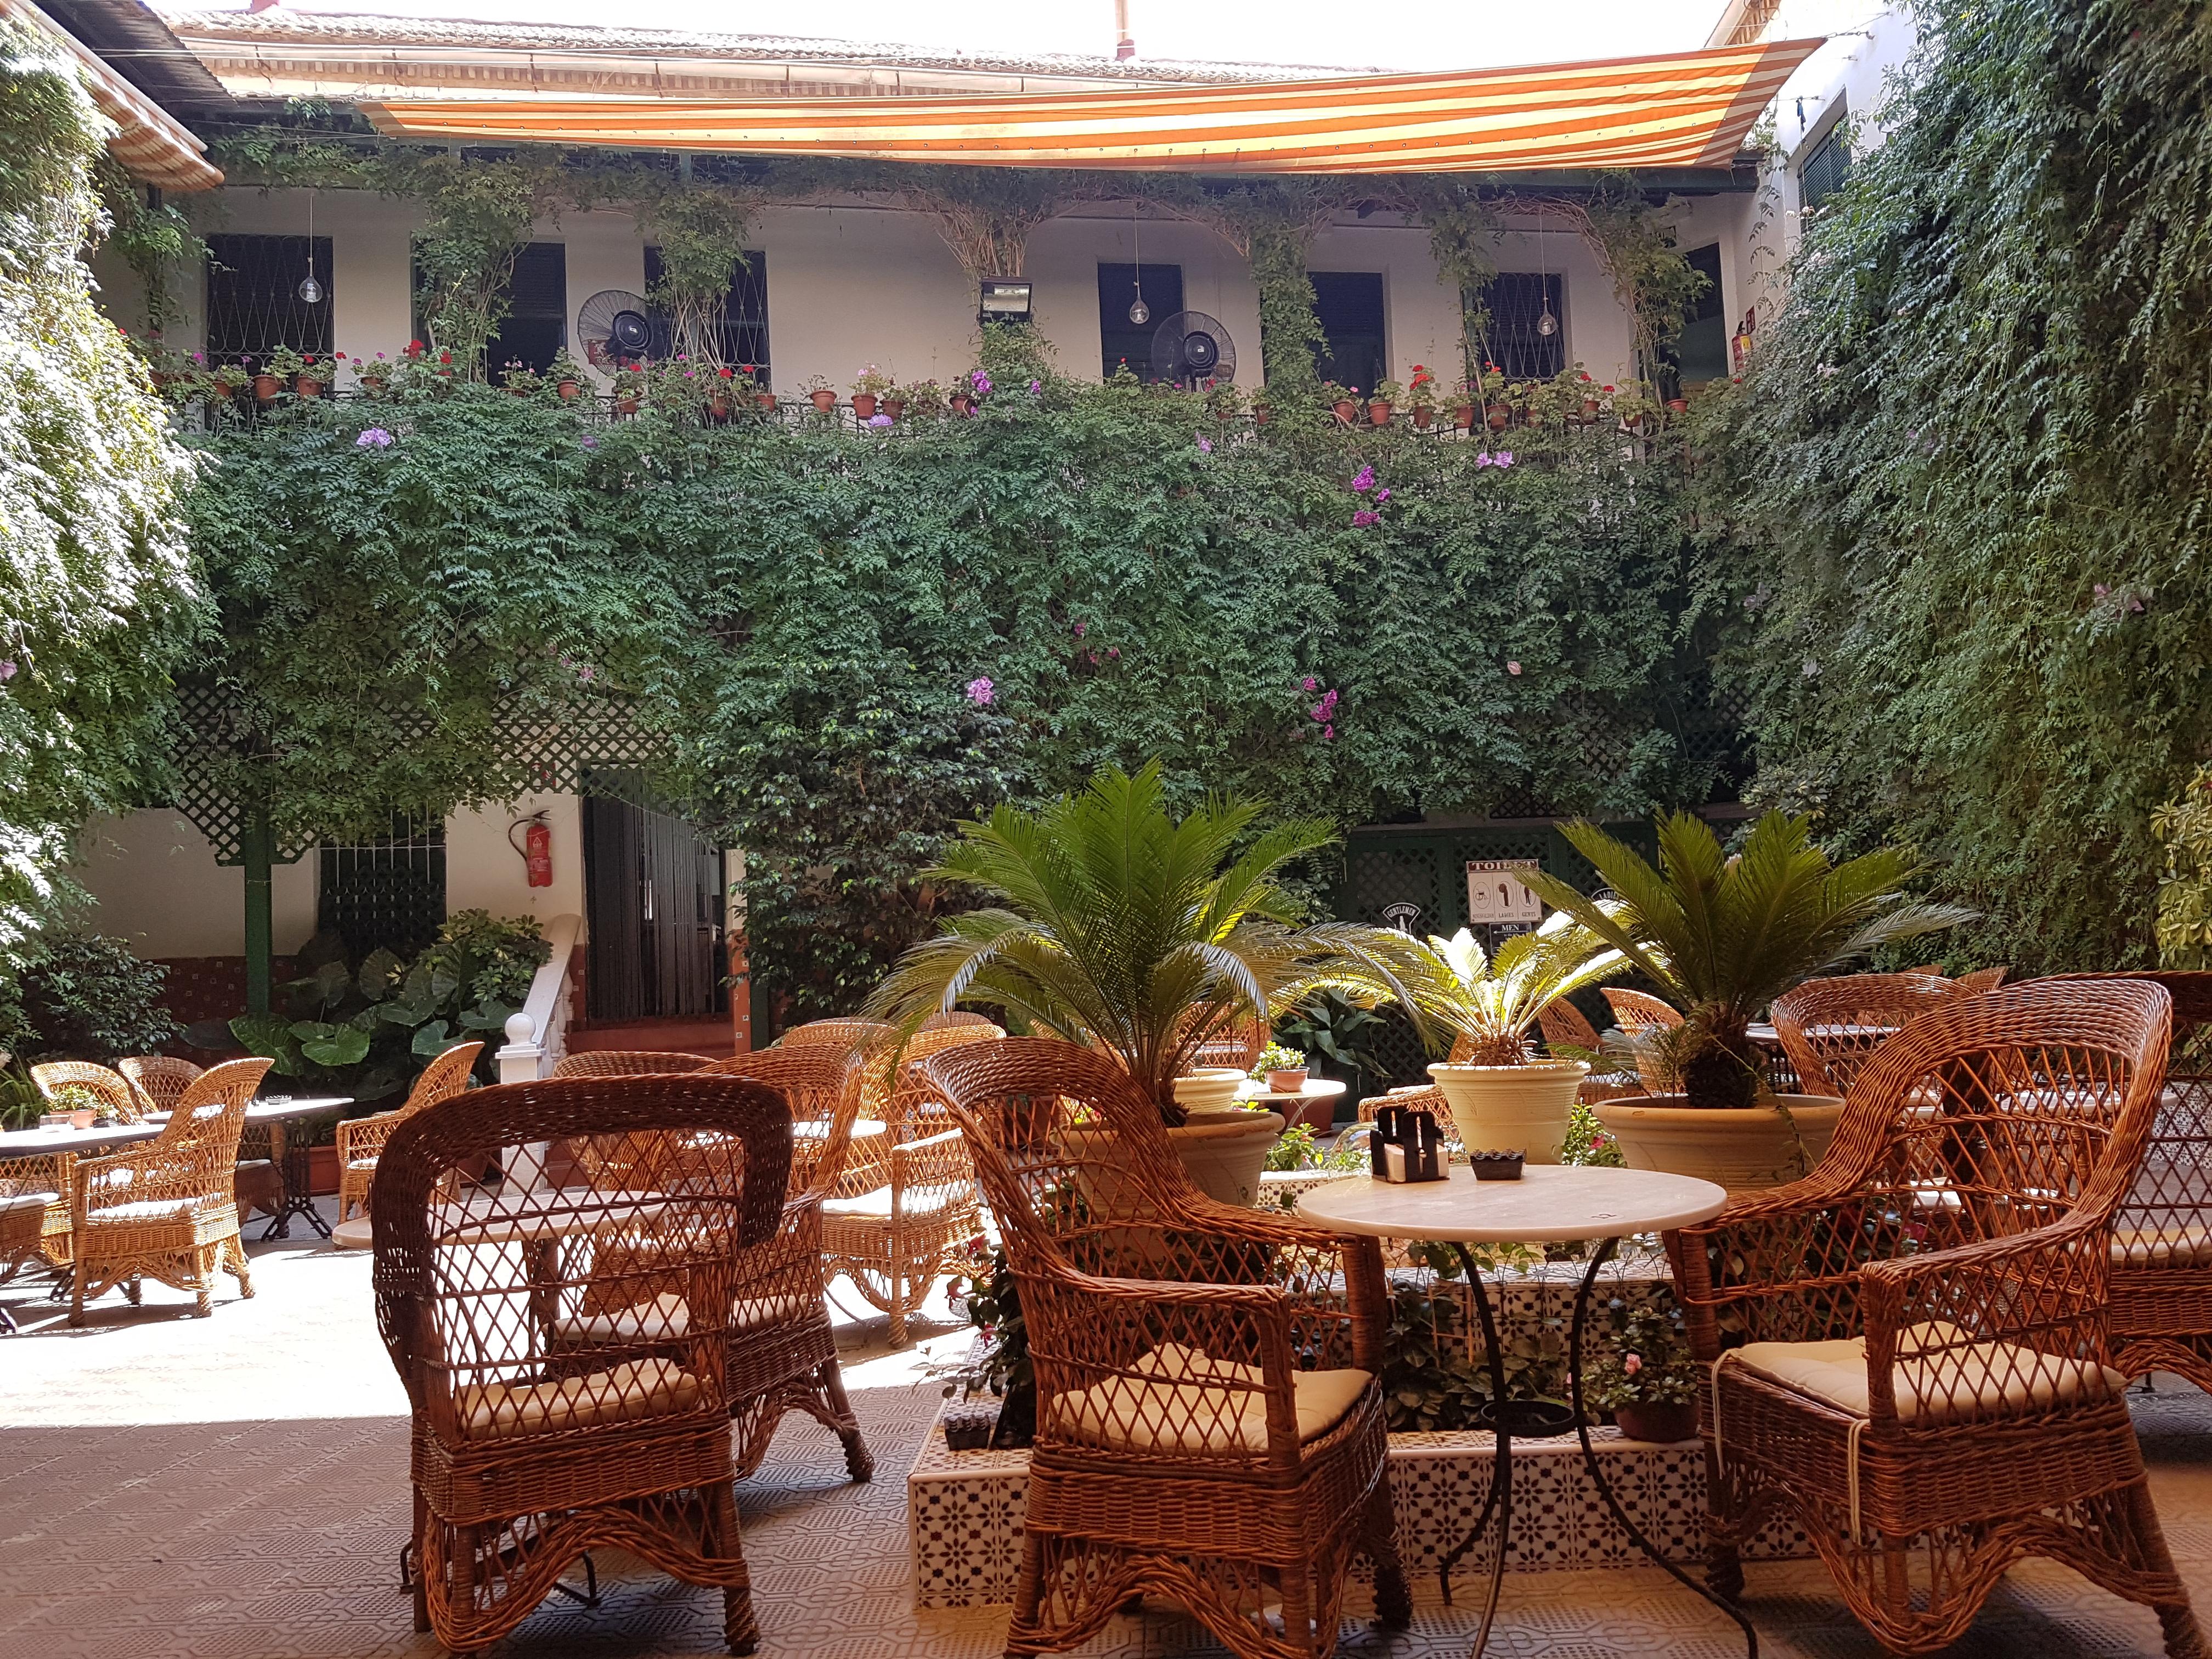 La Encarnacion courtyard